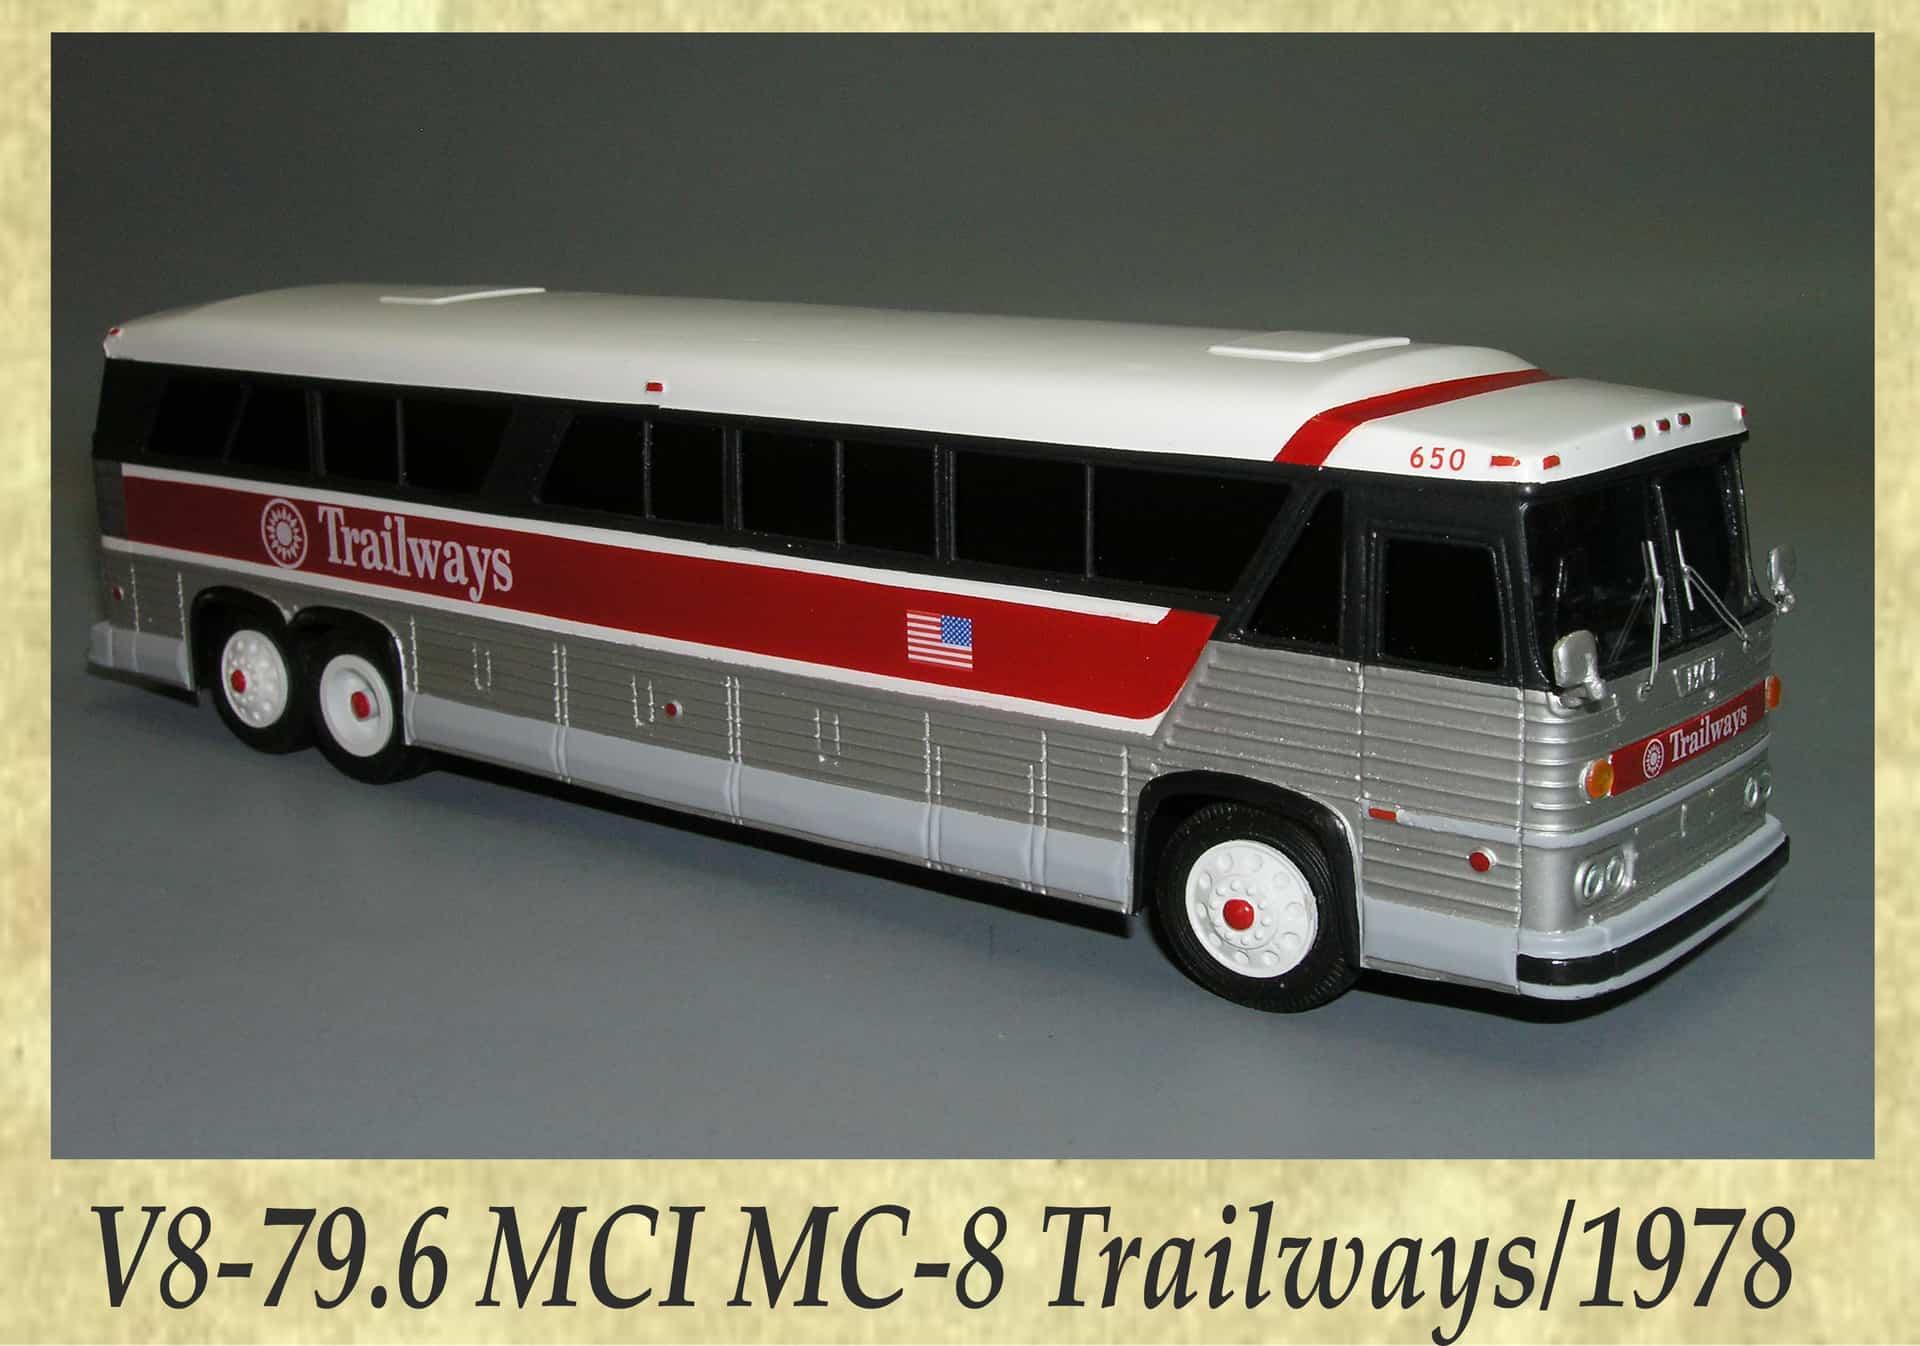 V8-79.6 MCI MC-8 Trailways 1978